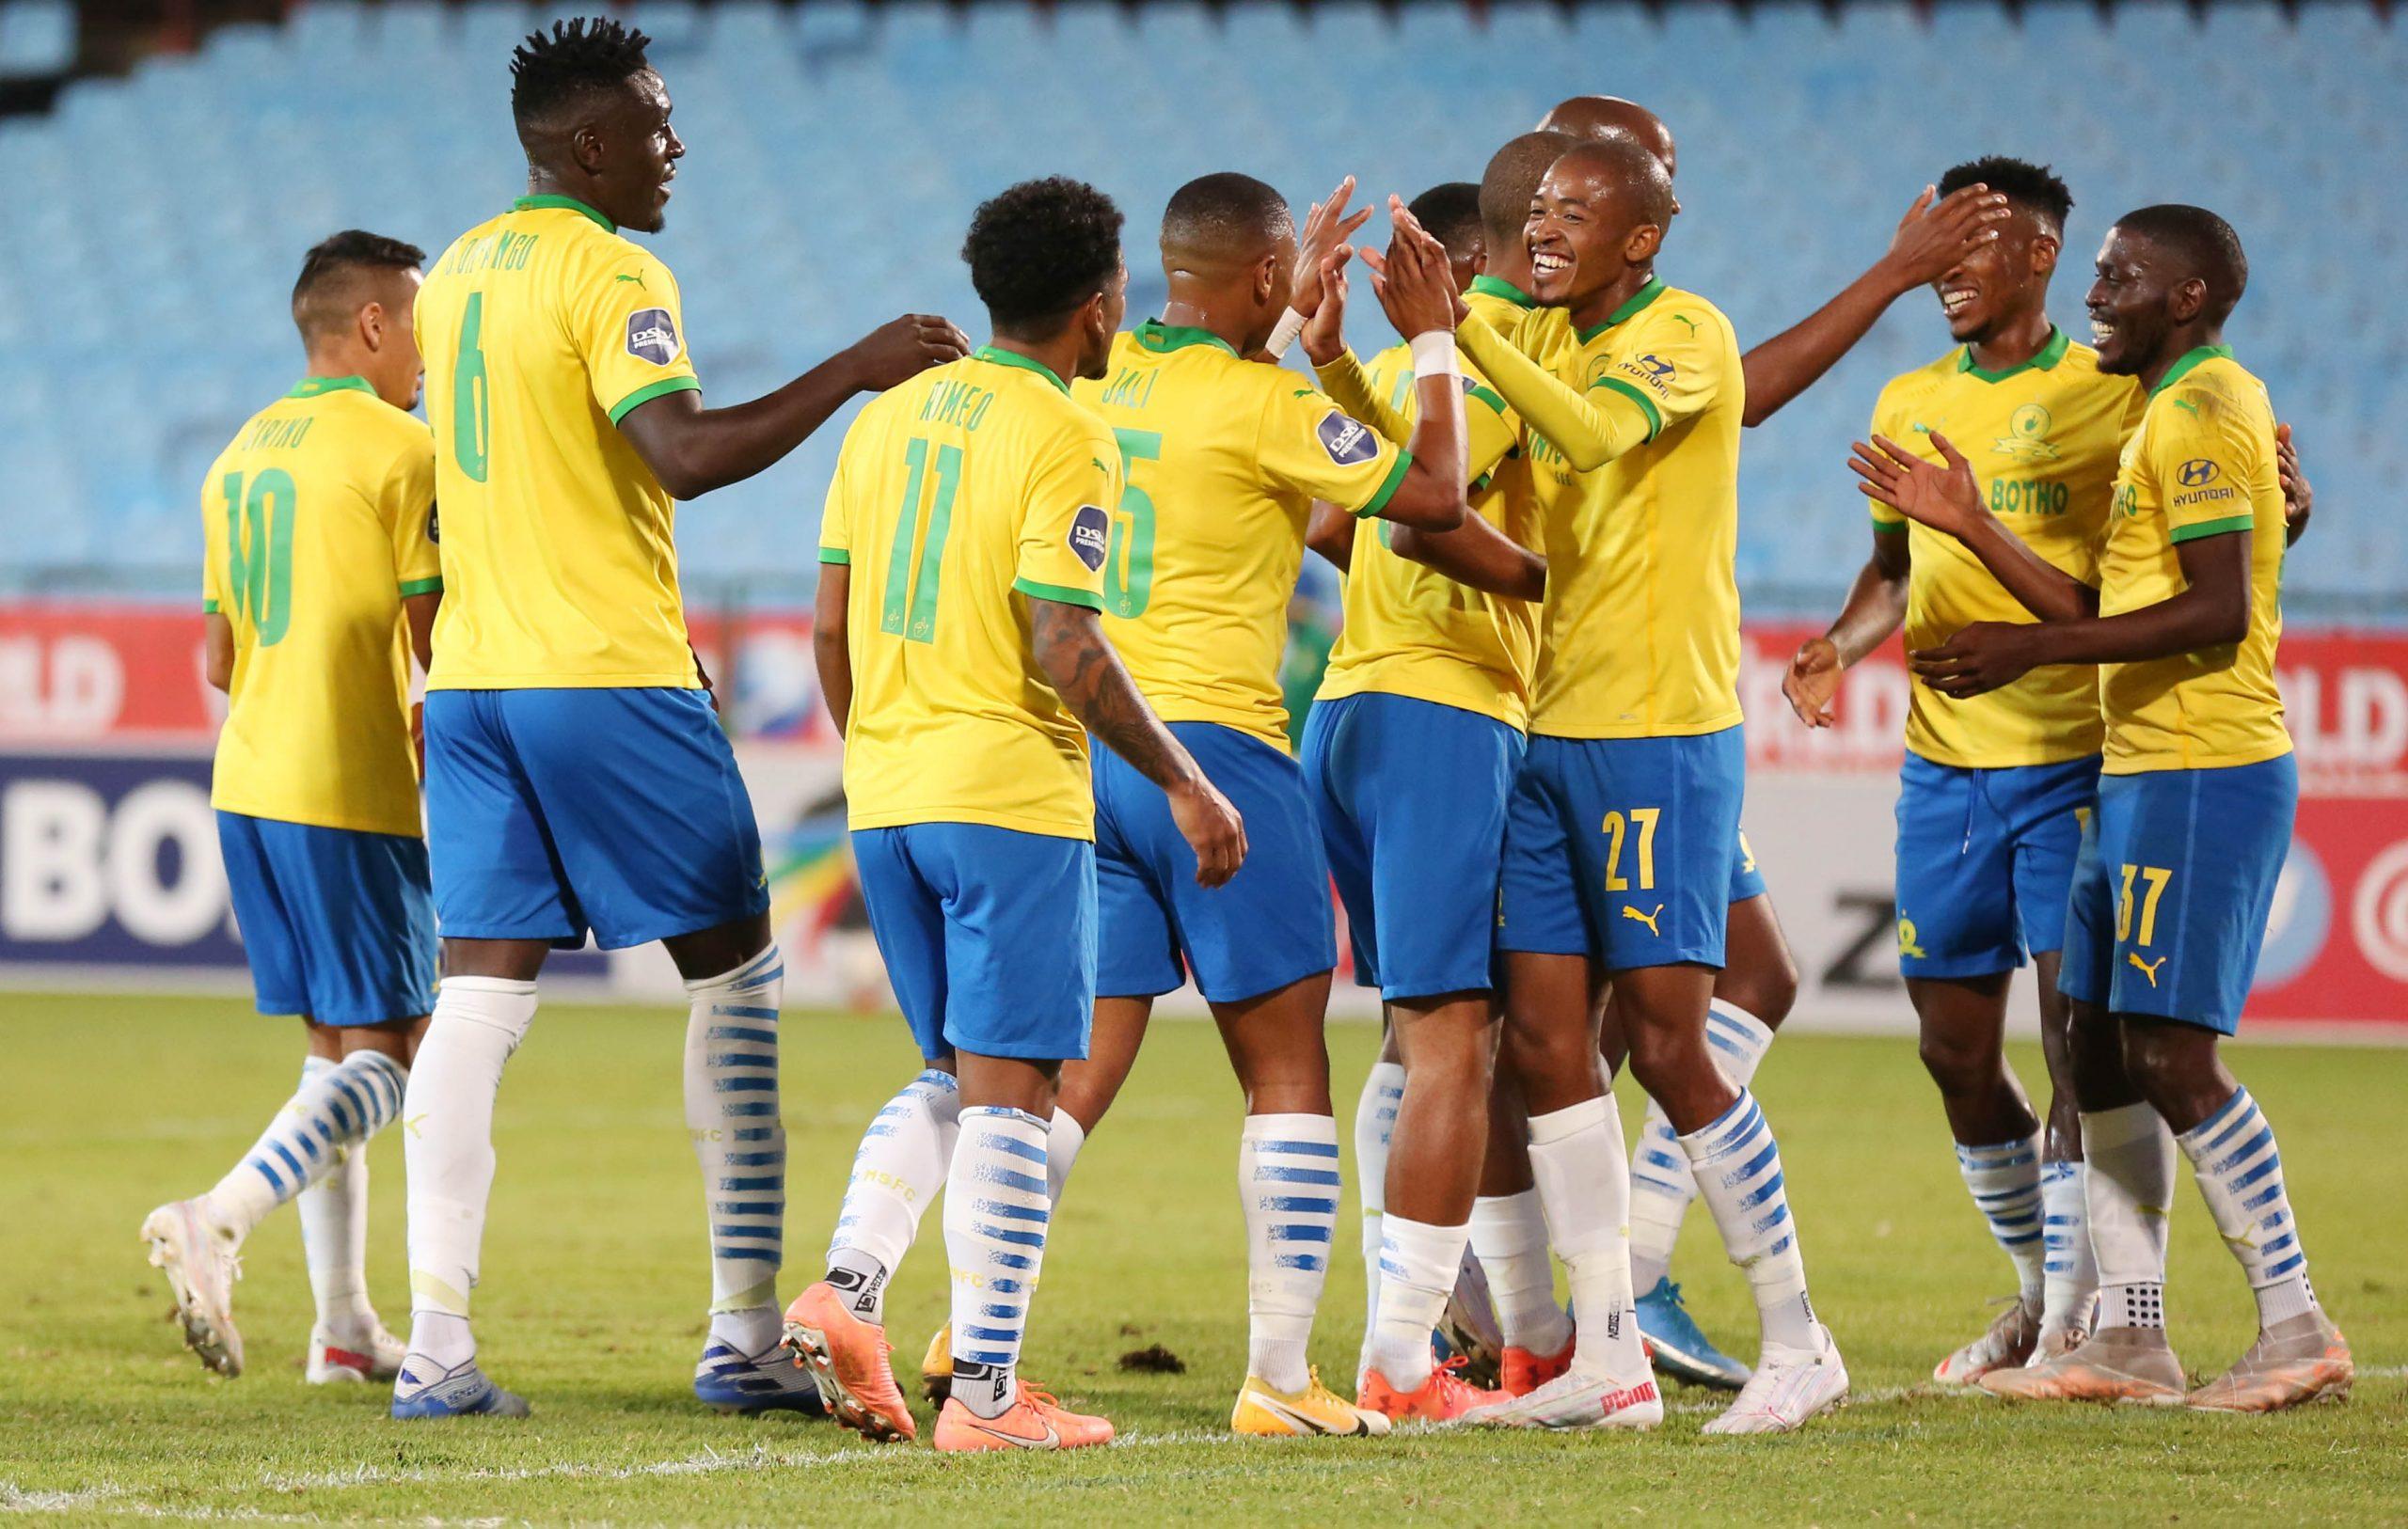 Mamelodi Sundowns clinch their 4th League title in 5 years ...